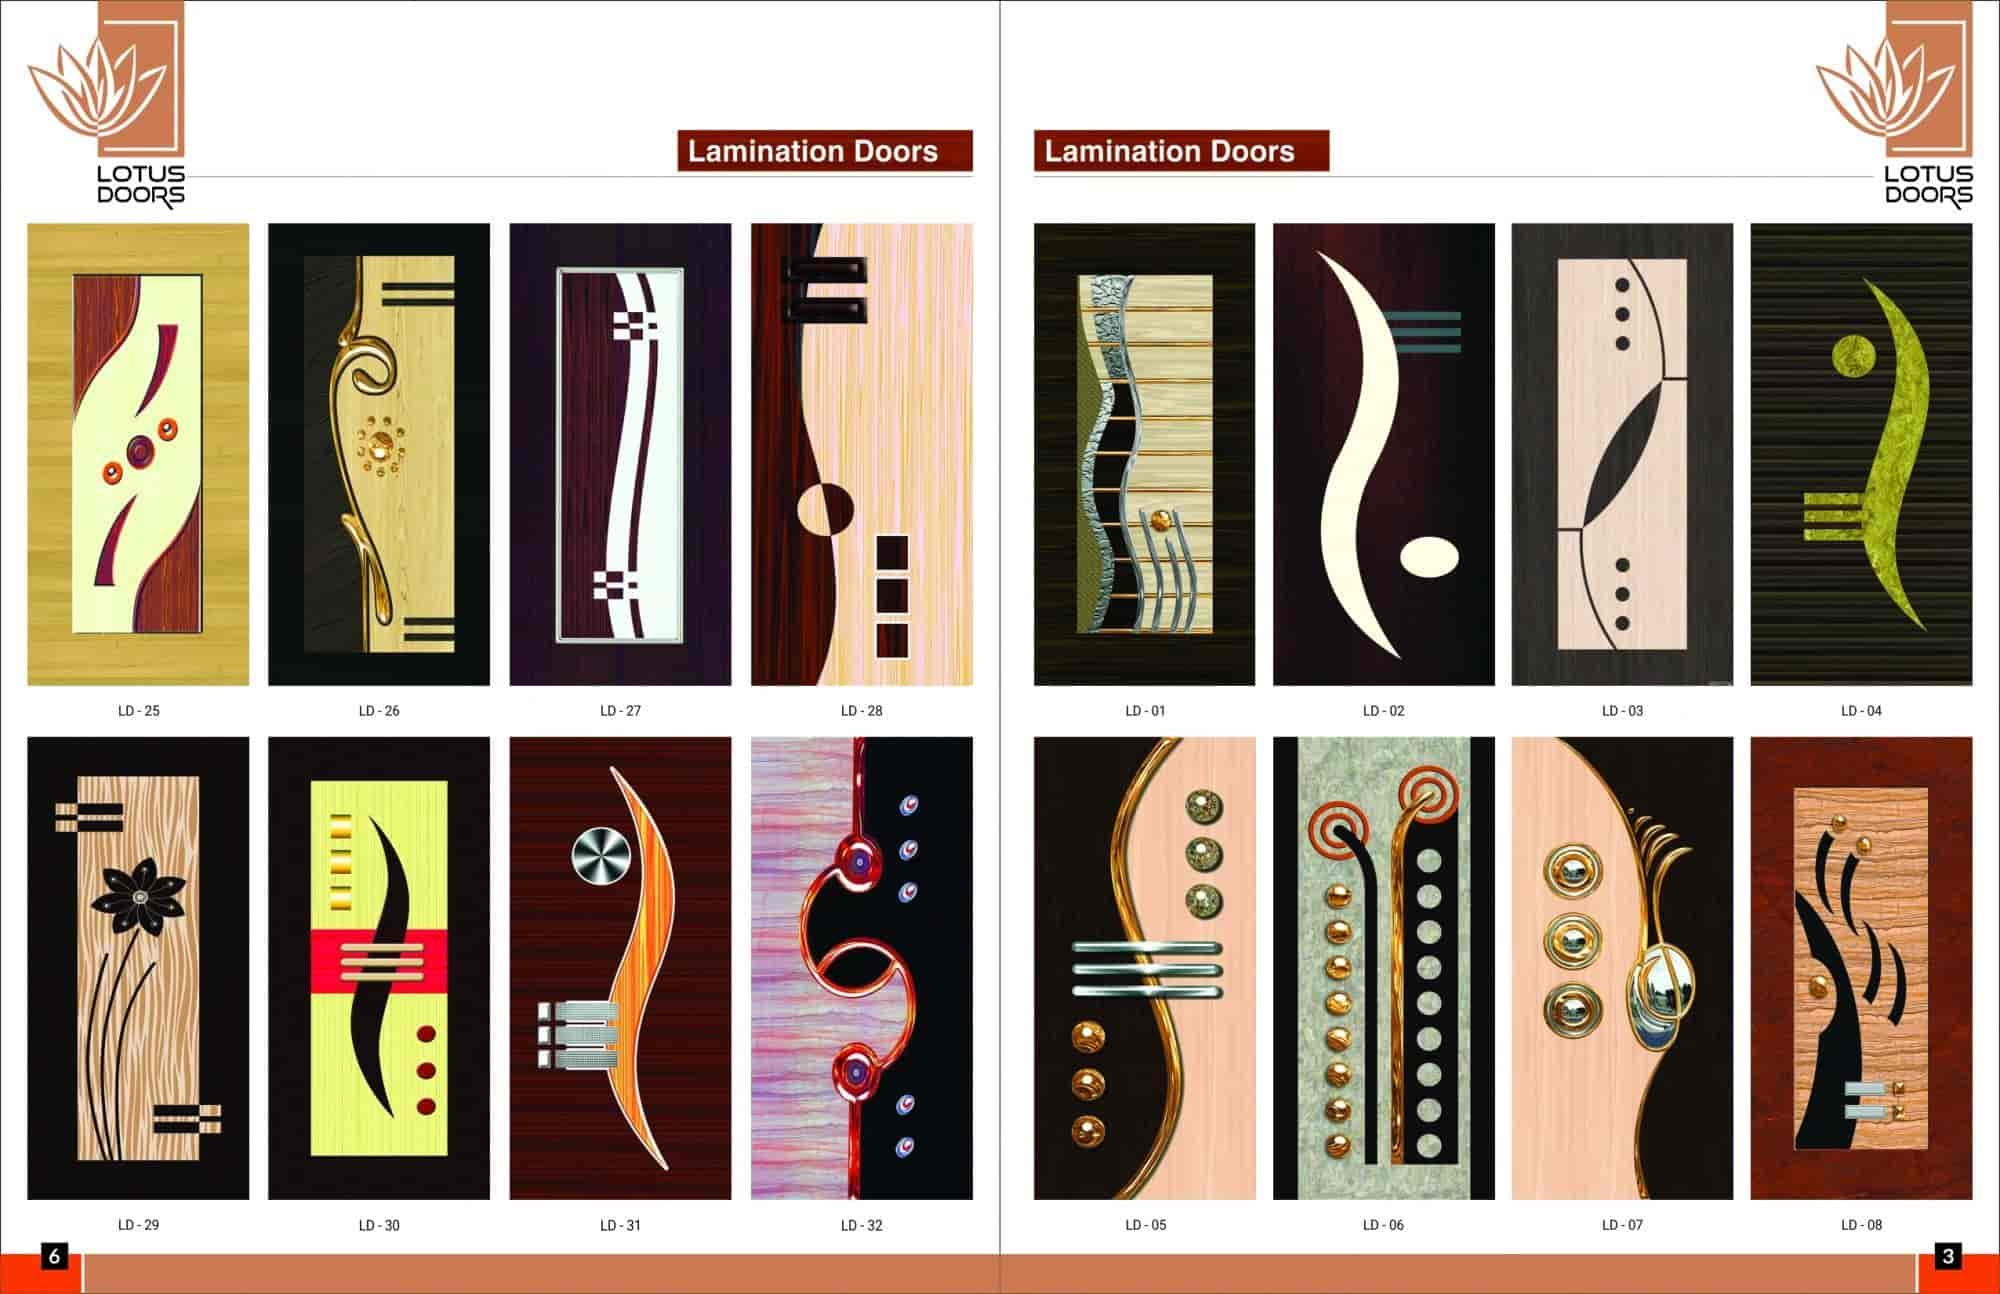 ... Product Catalog - Lotus Doors Photos Hinjawadi Pune - Laminated Door Dealers ... & Lotus Doors Photos Hinjawadi Pune- Pictures u0026 Images Gallery ...